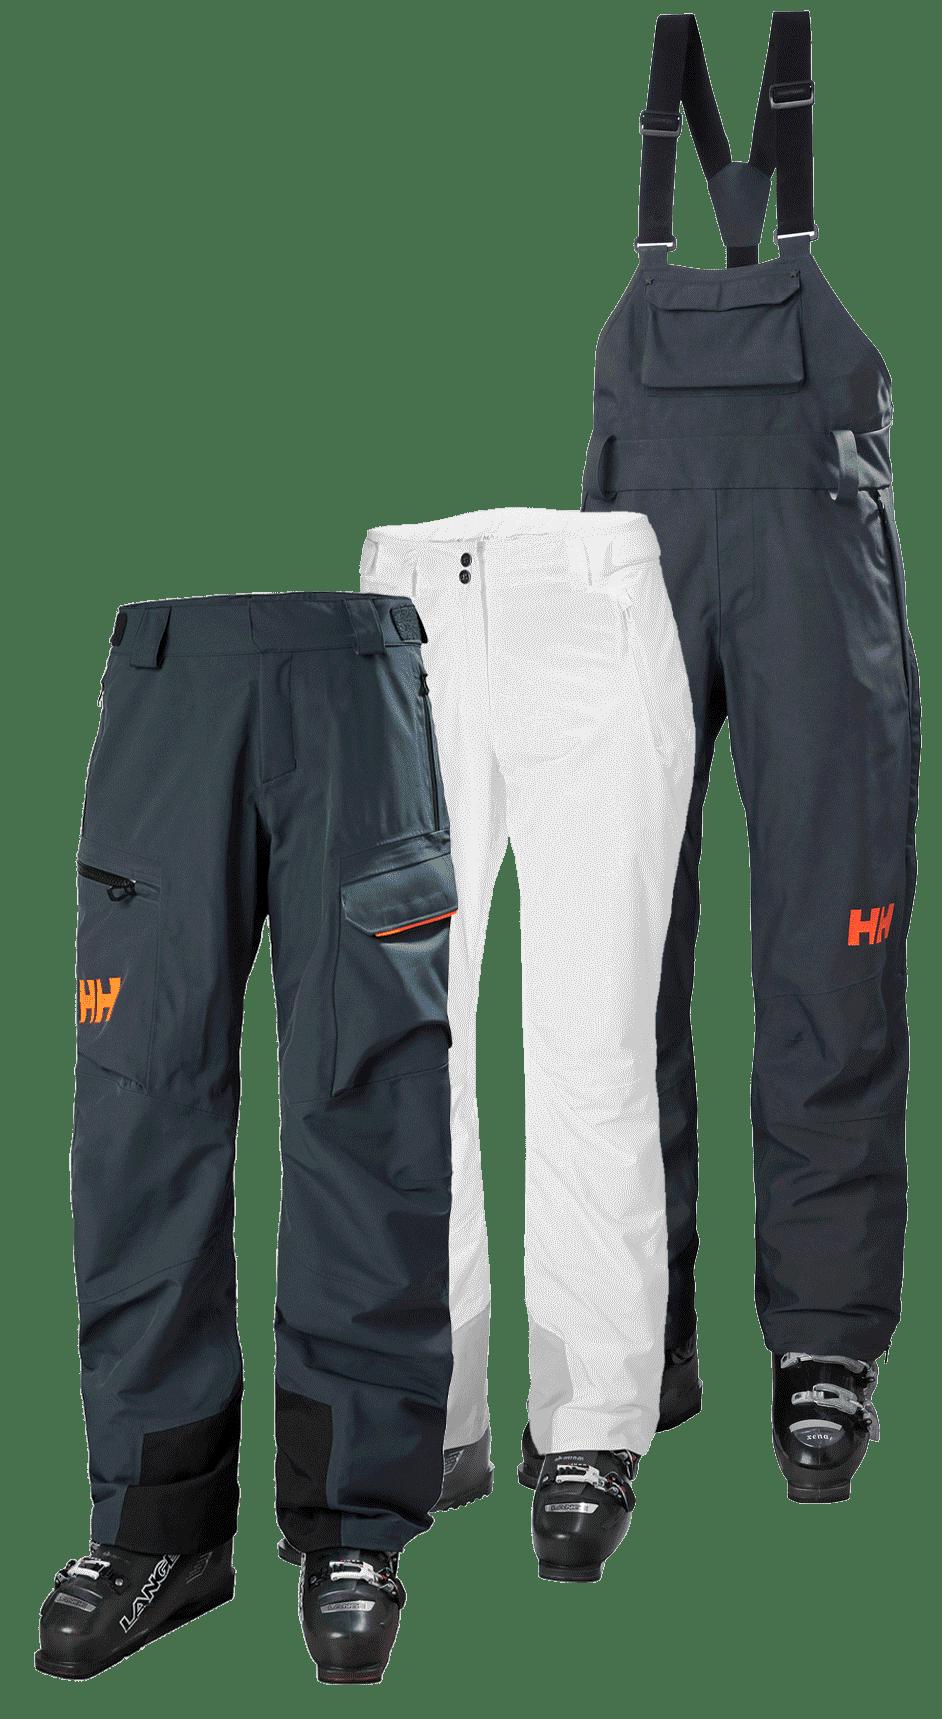 Active pants, Outerwear, Shoe, Workwear, Sleeve, Bag, Waist, Sportswear, Grey, Collar